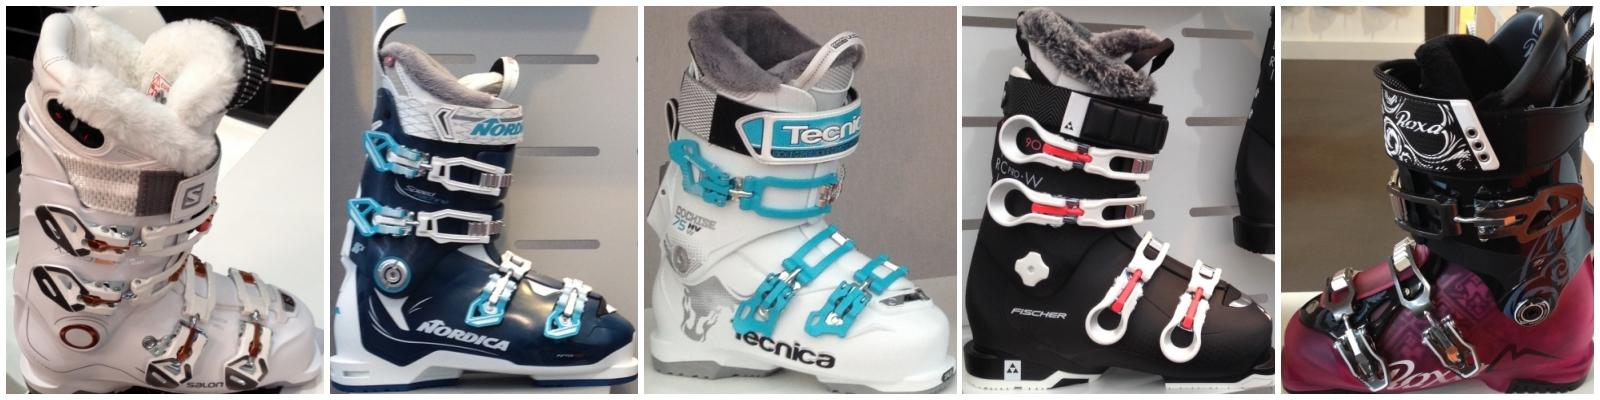 snowflike-tecnica-nordica-salomon-roxa-fischer-choisir-skieuse